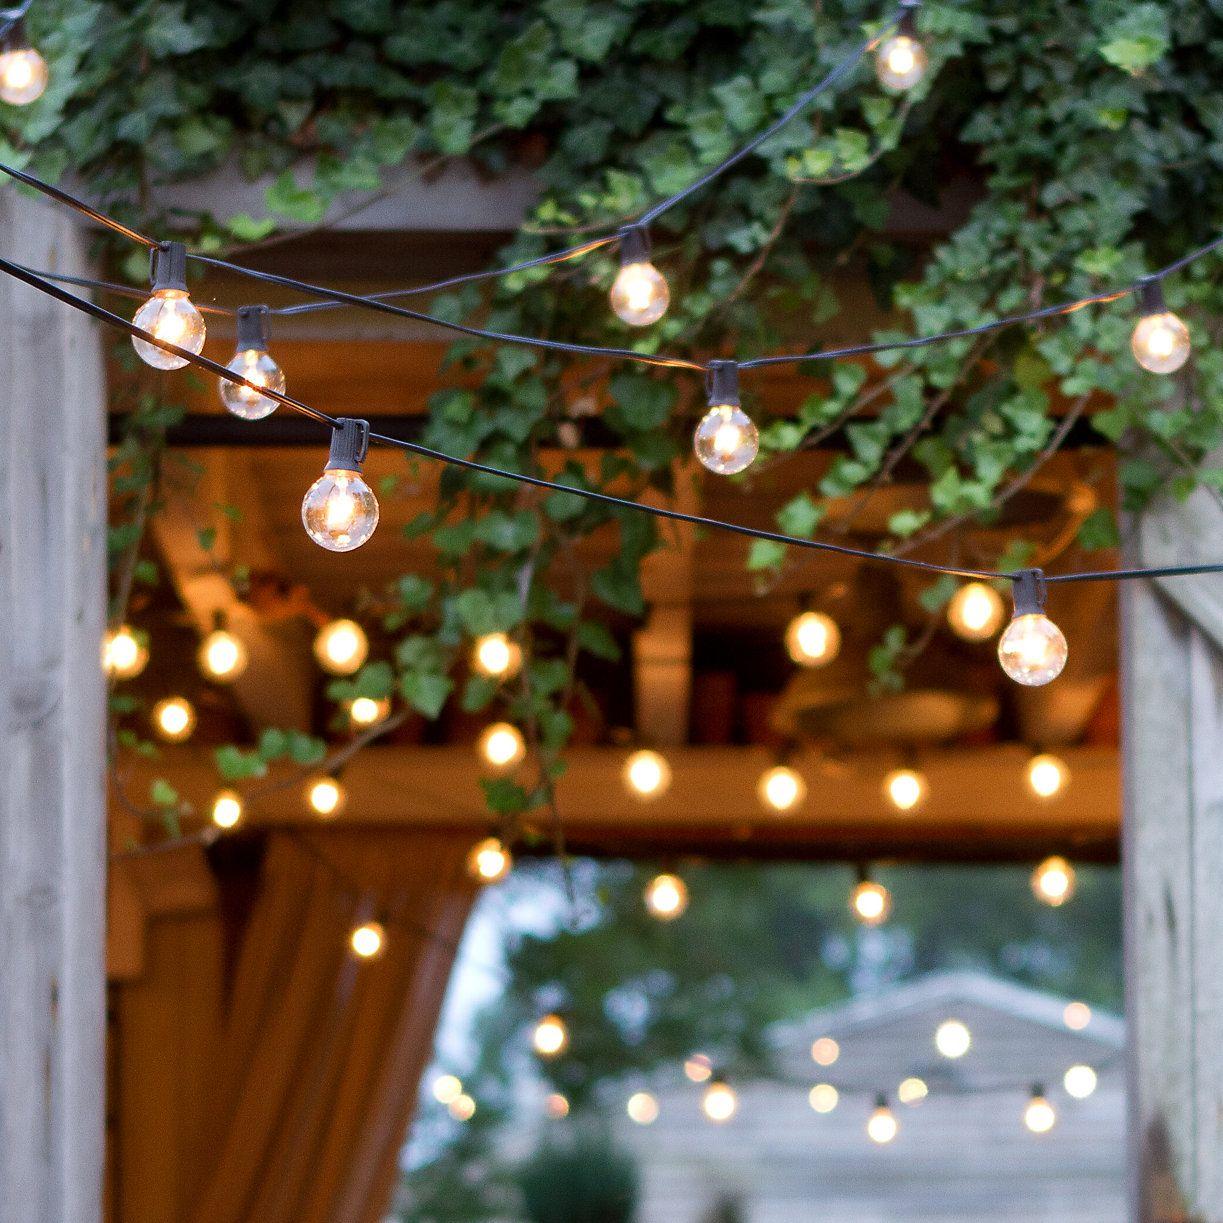 stargazer globe lights festival lights outdoor living furniture